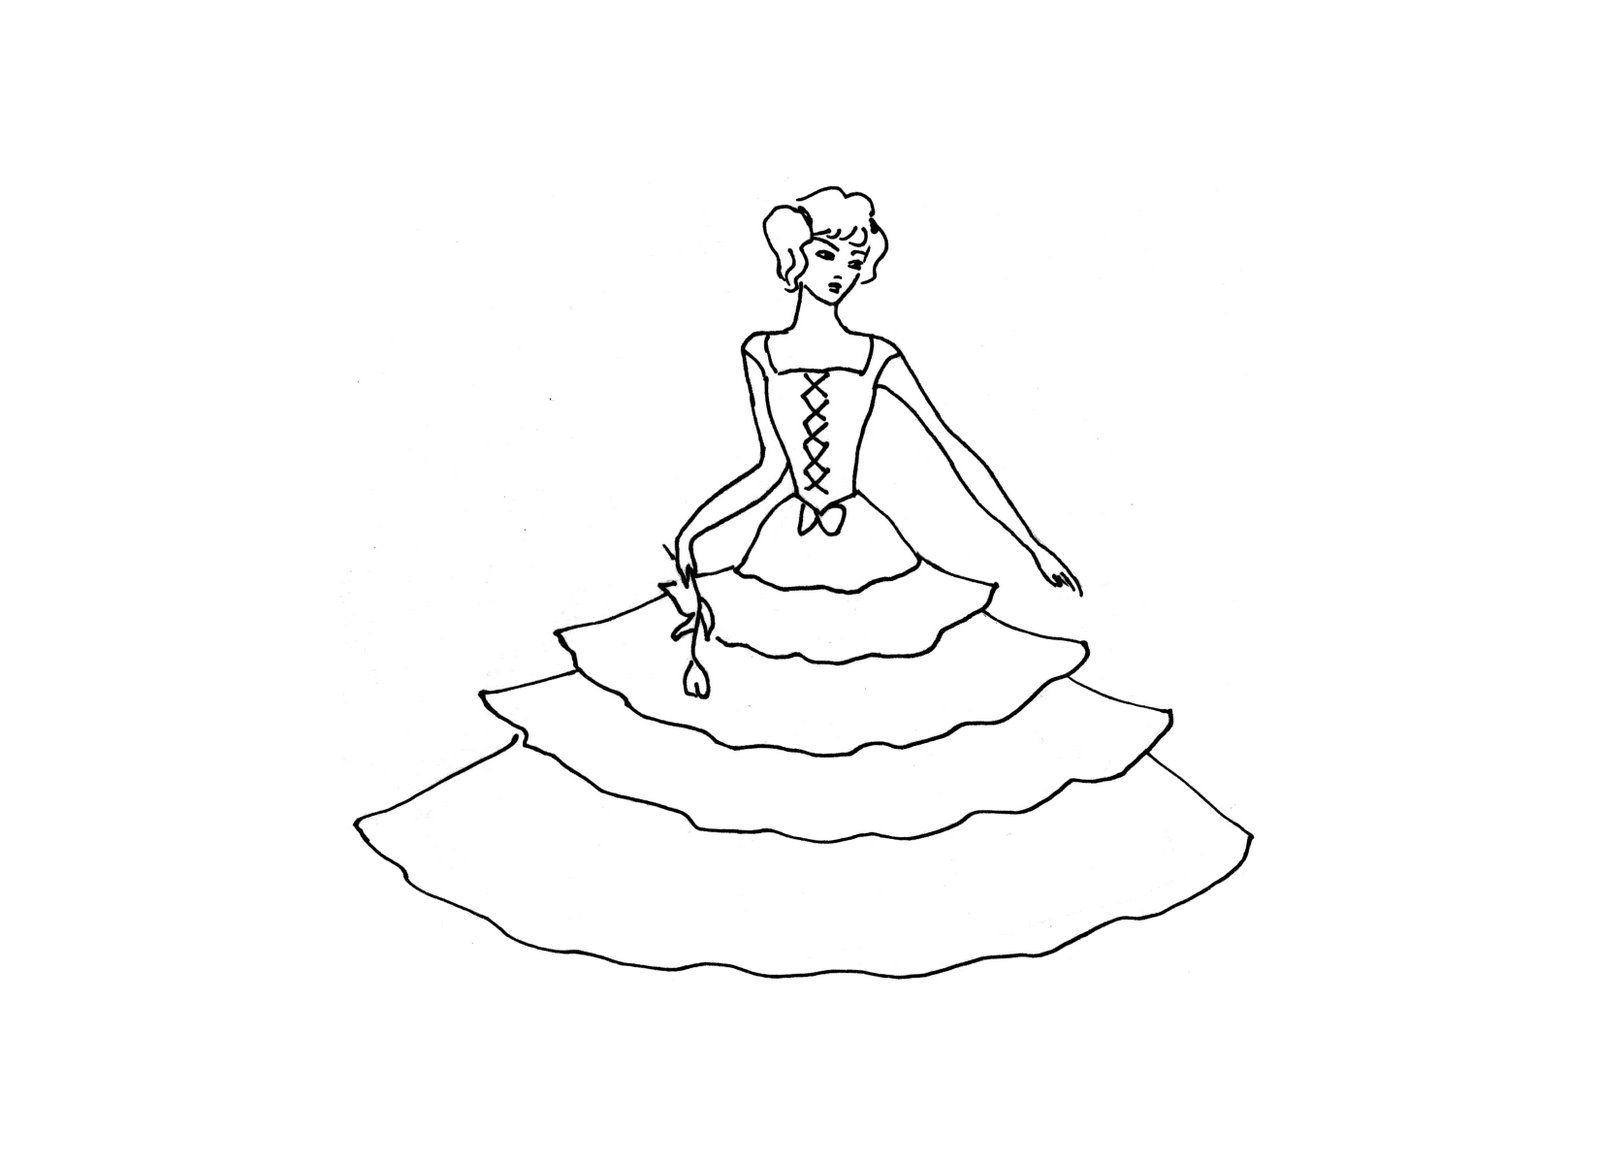 princess color pages printable | ... princess coloring pages free ...